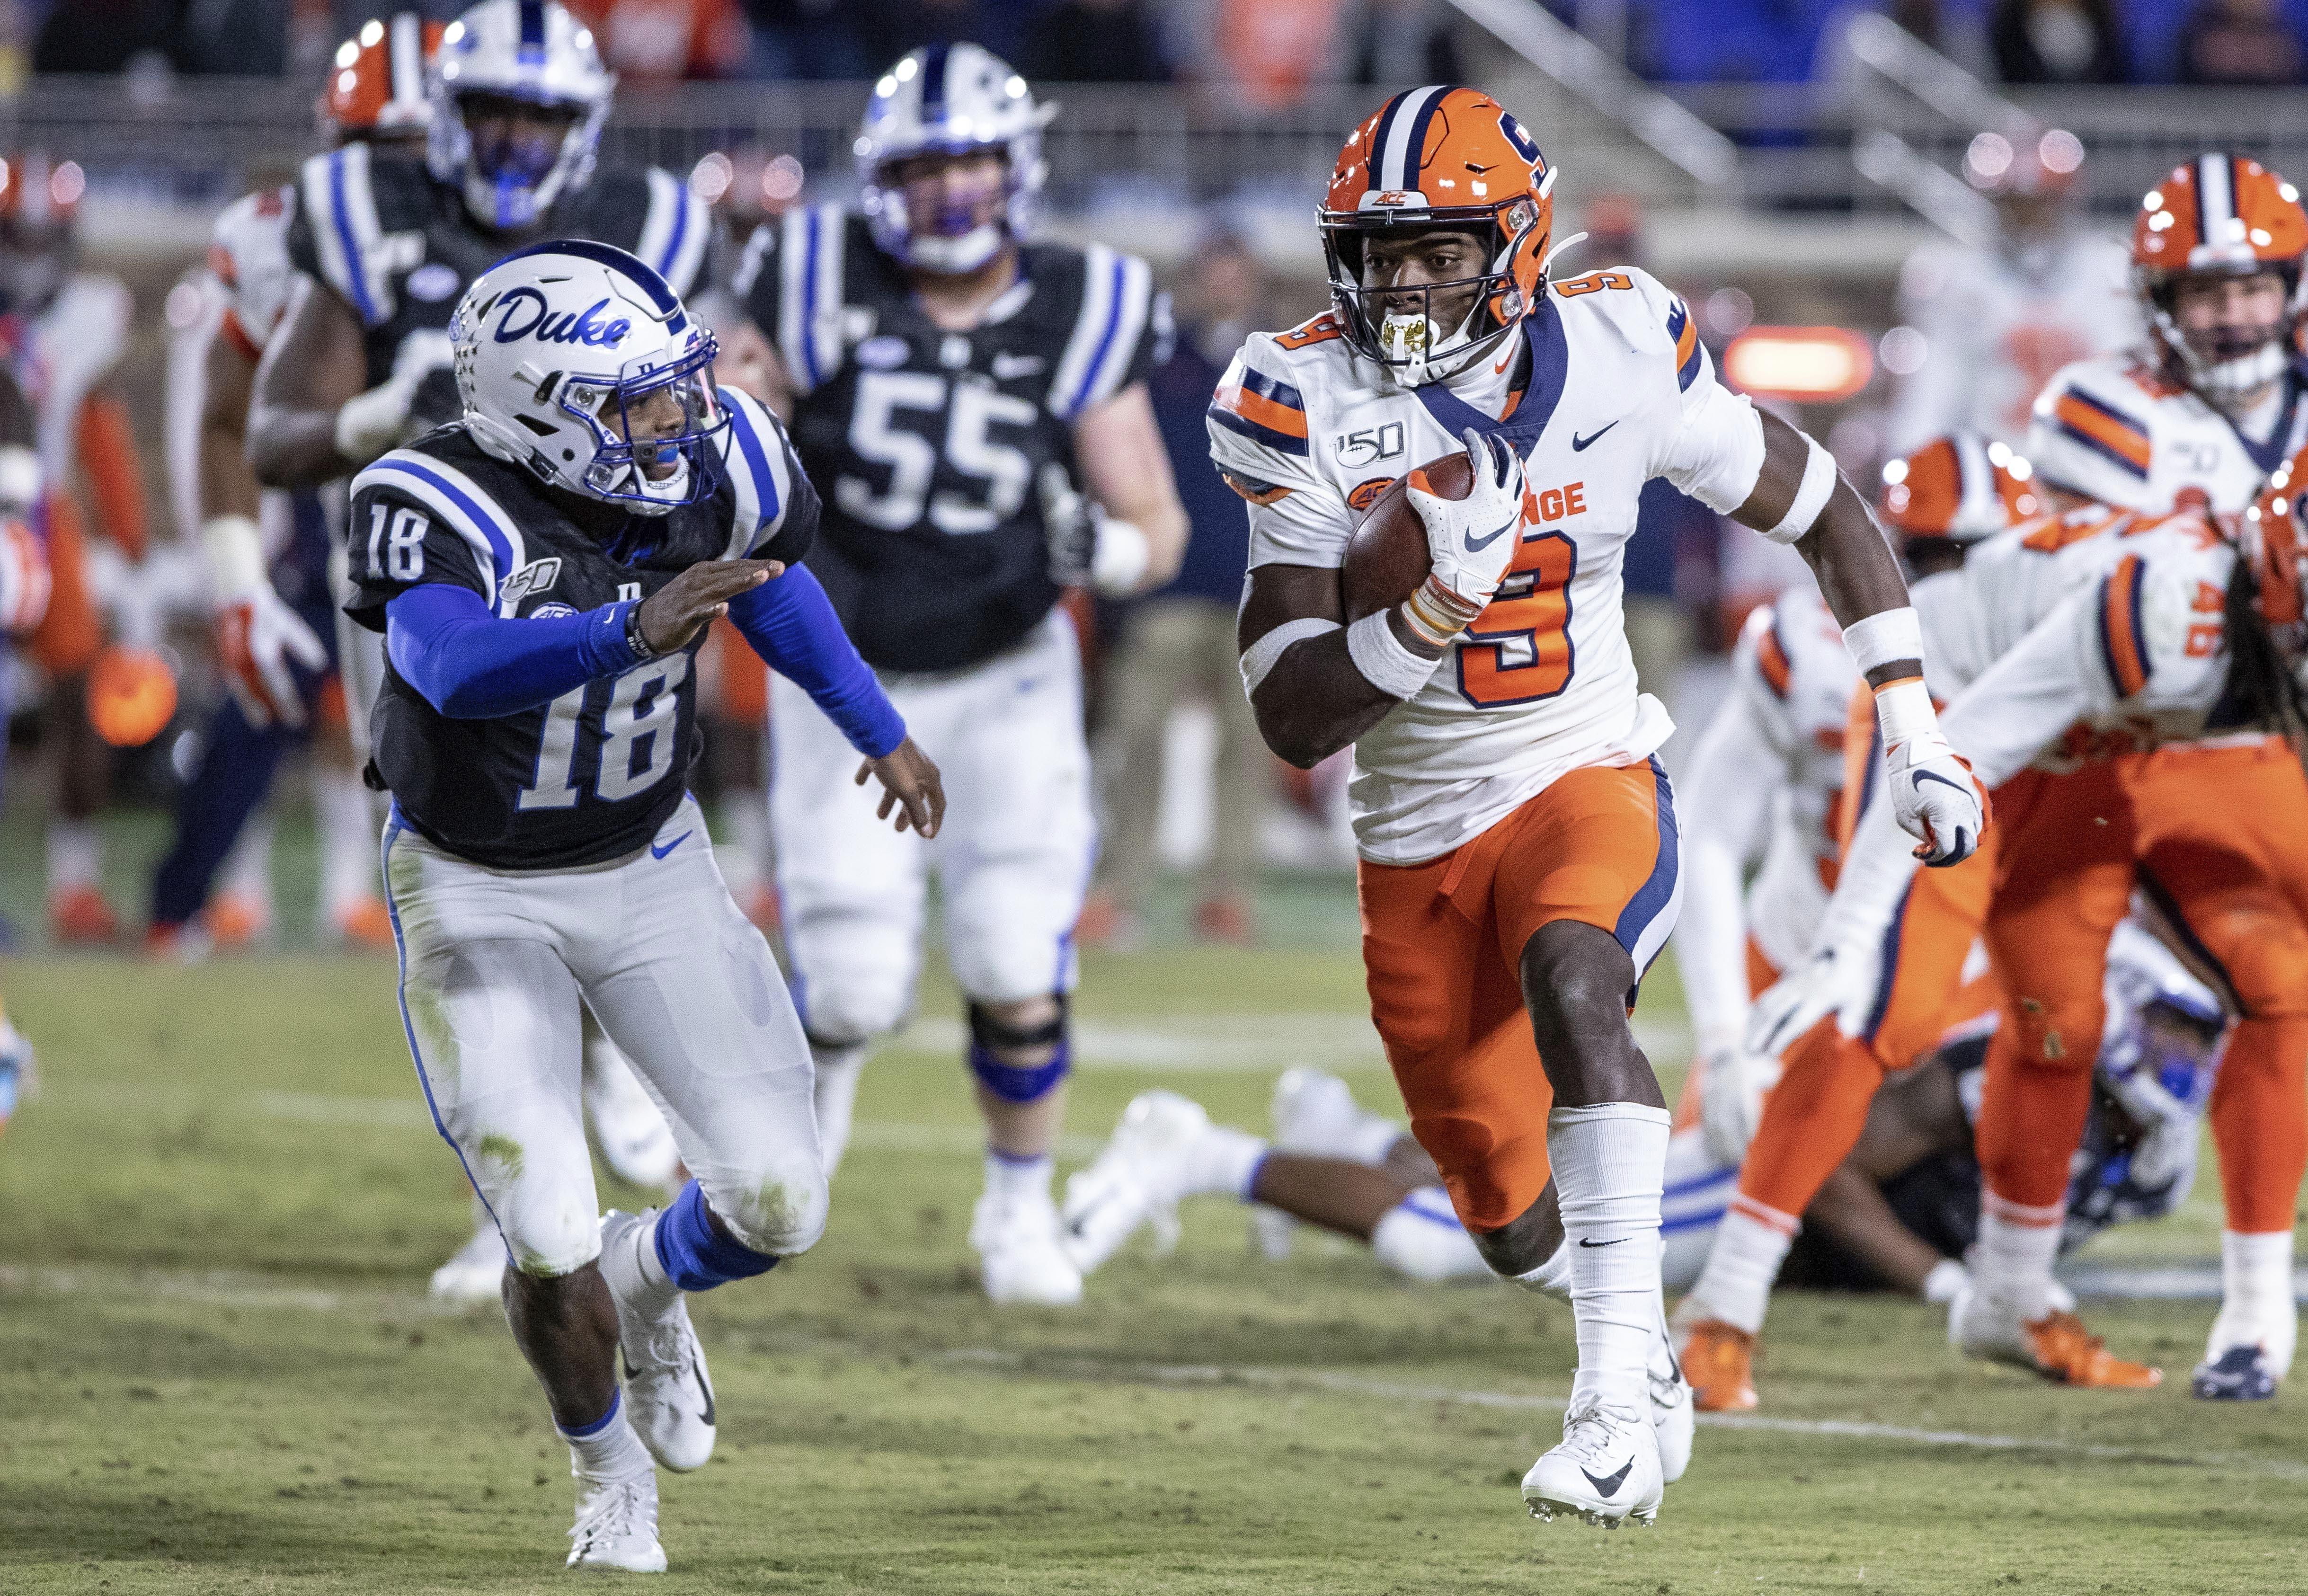 Syracuse Football Vs Duke Tv Channel Time How To Watch Free Live Stream Syracuse Com